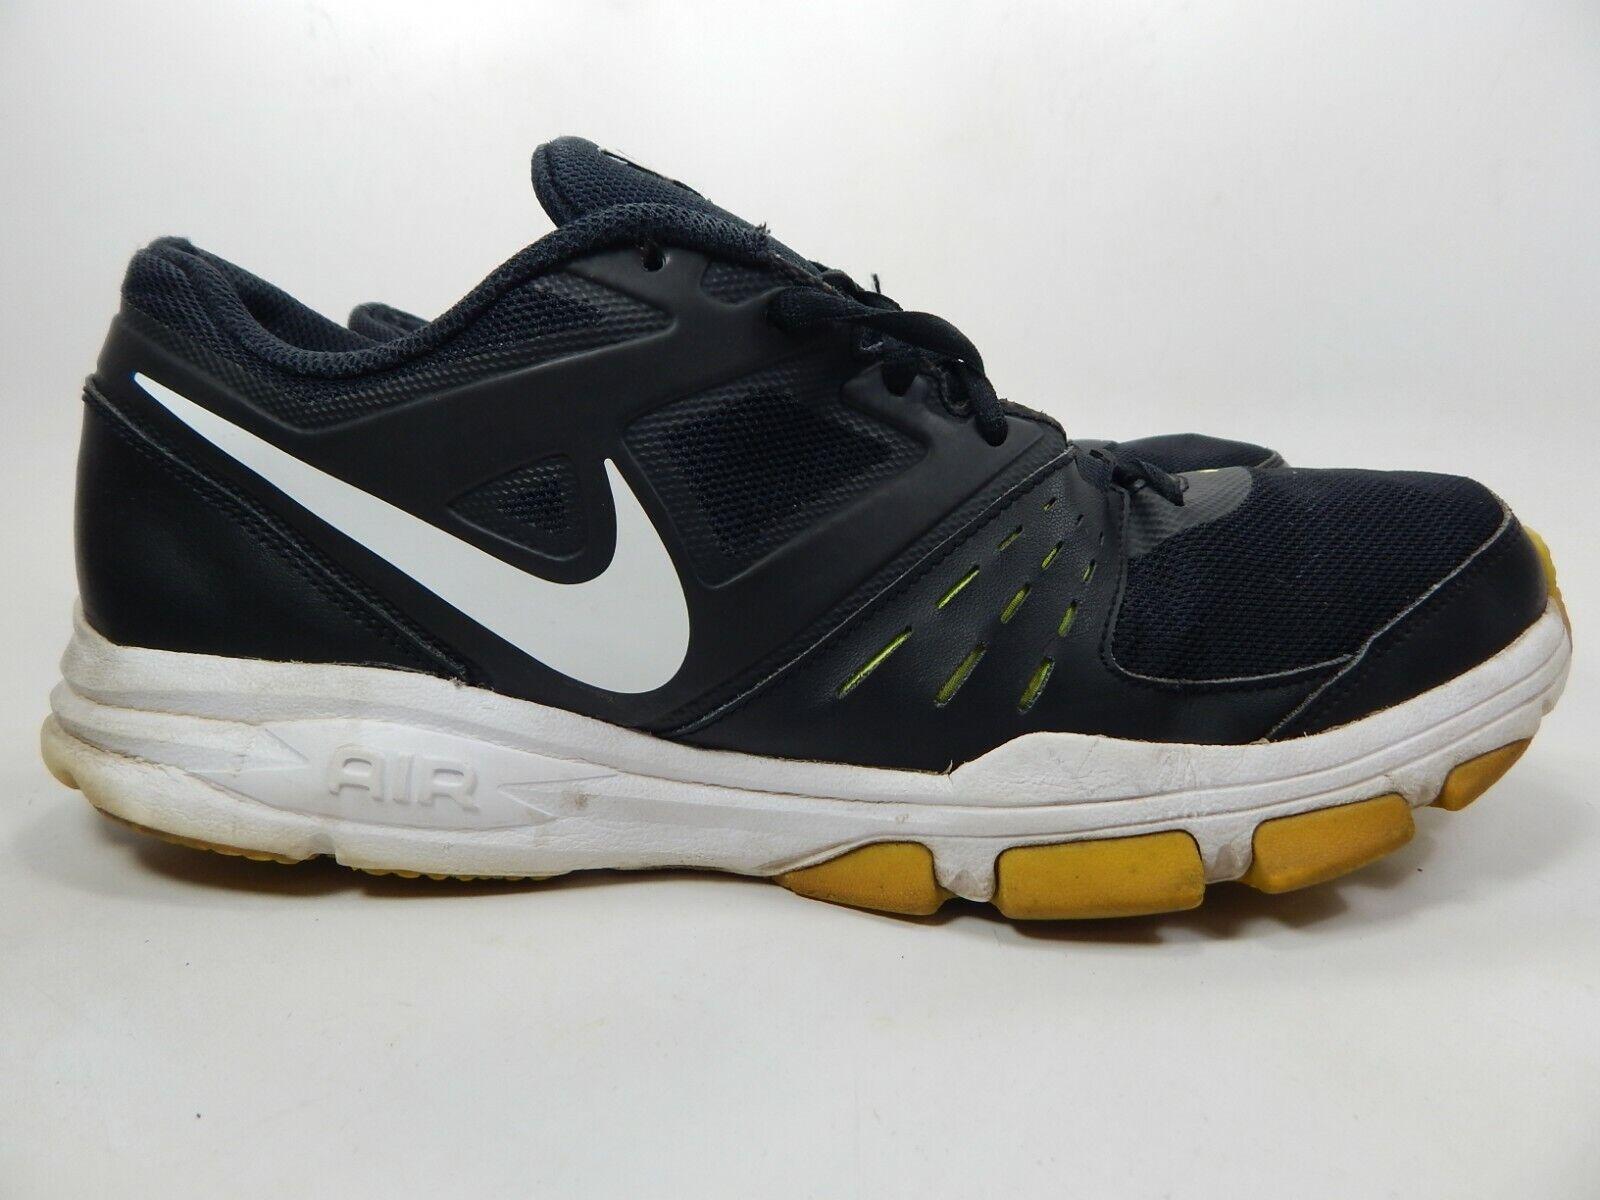 Nike Air One TR Size US 14 M (D) EU 48.5 Men's Training shoes Black 631276-008